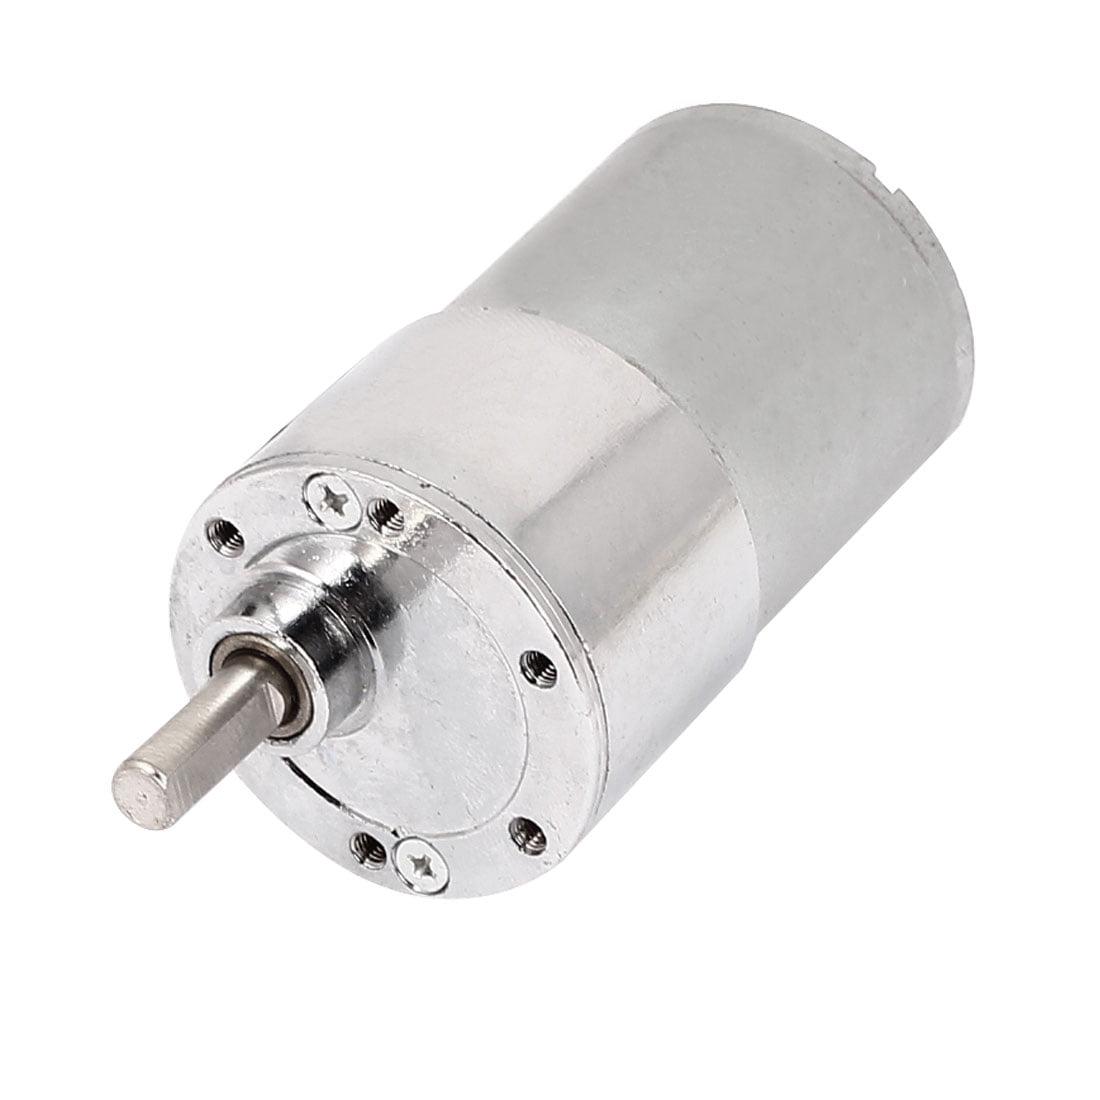 DC 12V 150RPM 6mm Shaft 37mm Body Dia Cylinder Shape Gear Box Motor - image 2 of 2